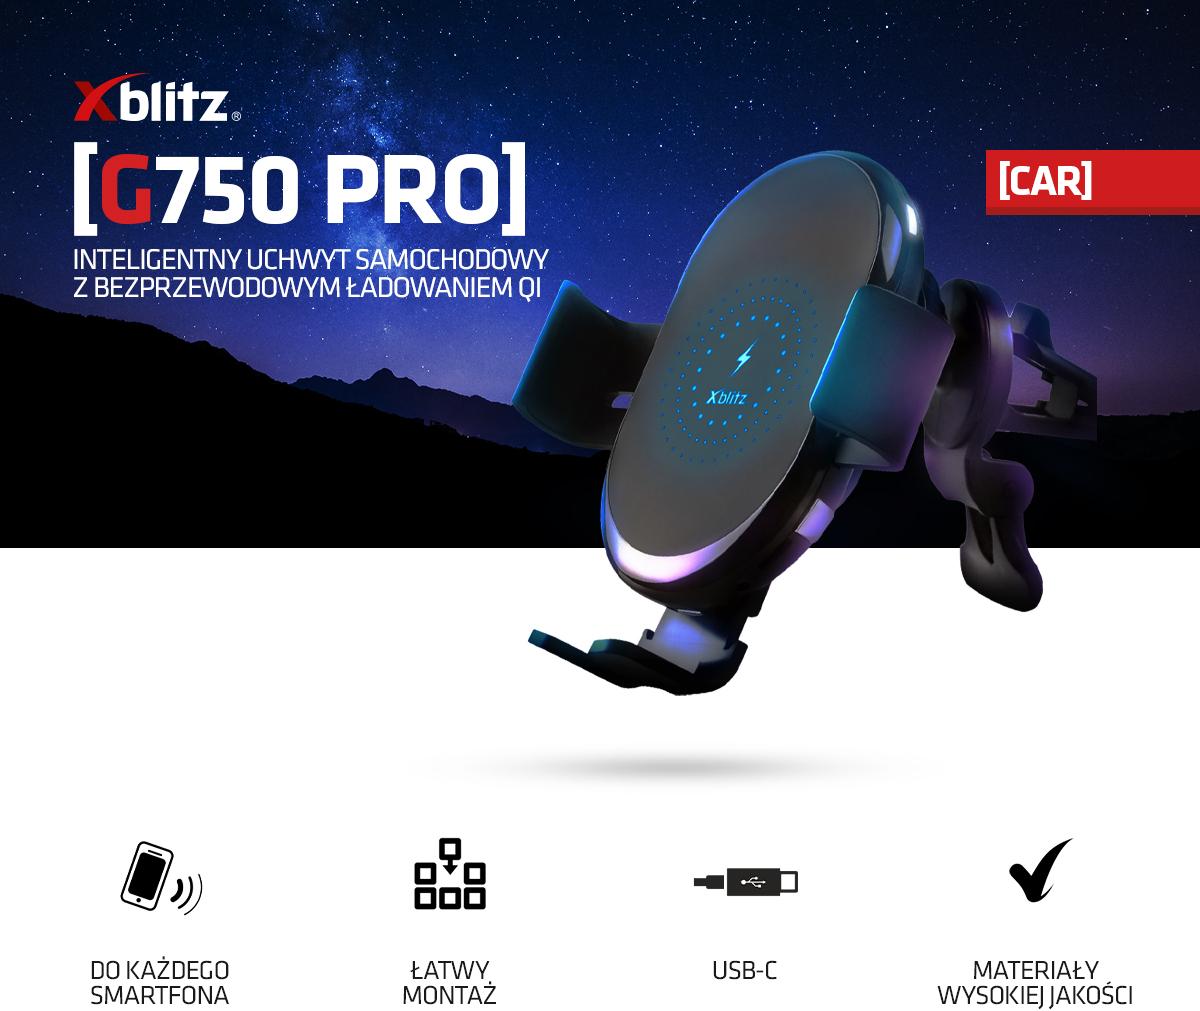 INTELIGENTNY UCHWYT SAMOCHODOWY XBLITZ G750 PRO